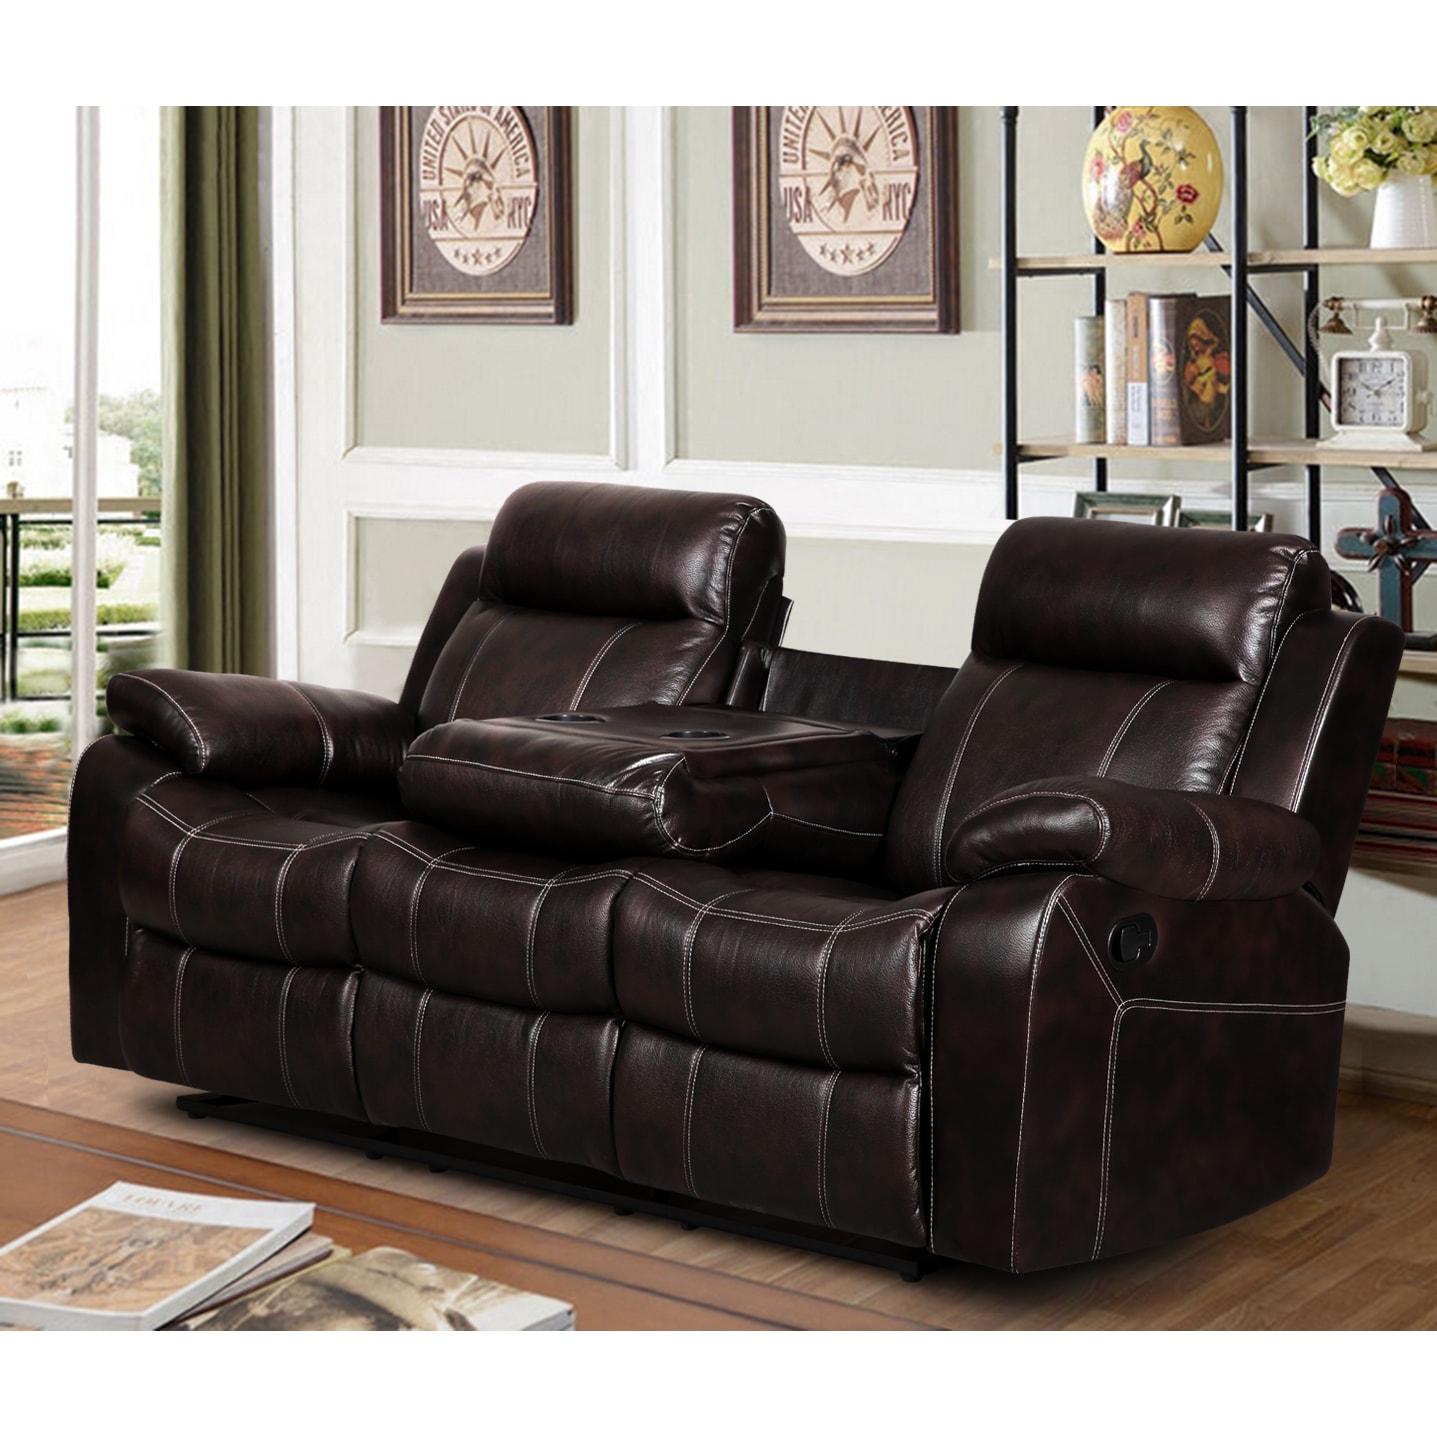 Finley Dark Brown Leather Gel Living Room Reclining Sofa ...